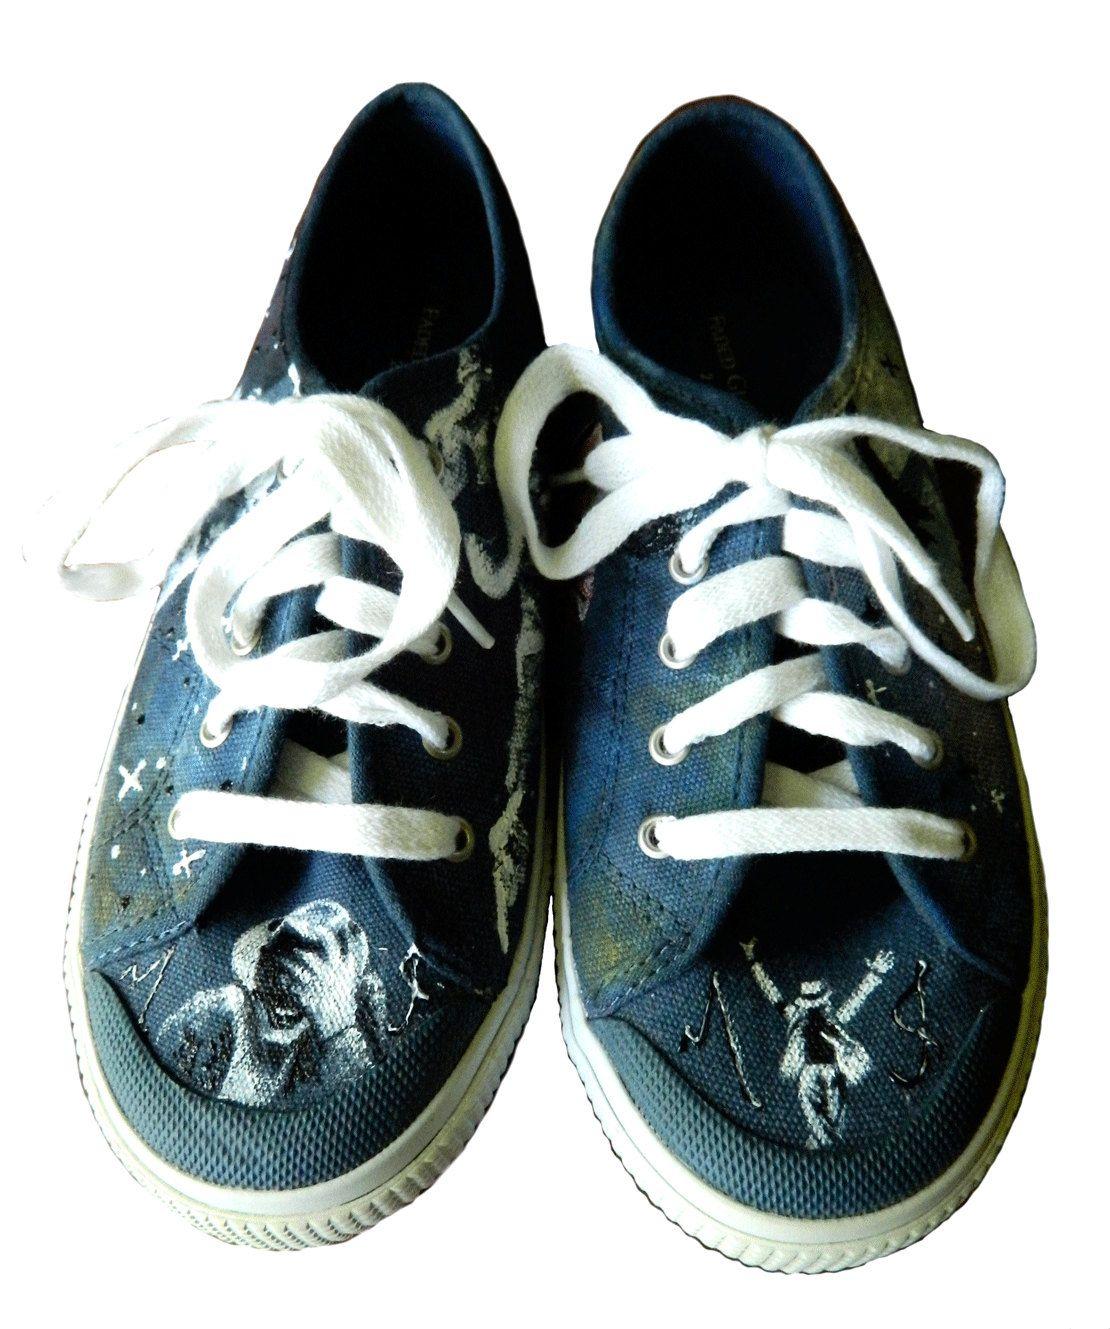 MJ customized converse shoes   Michael Jackson custom hand p